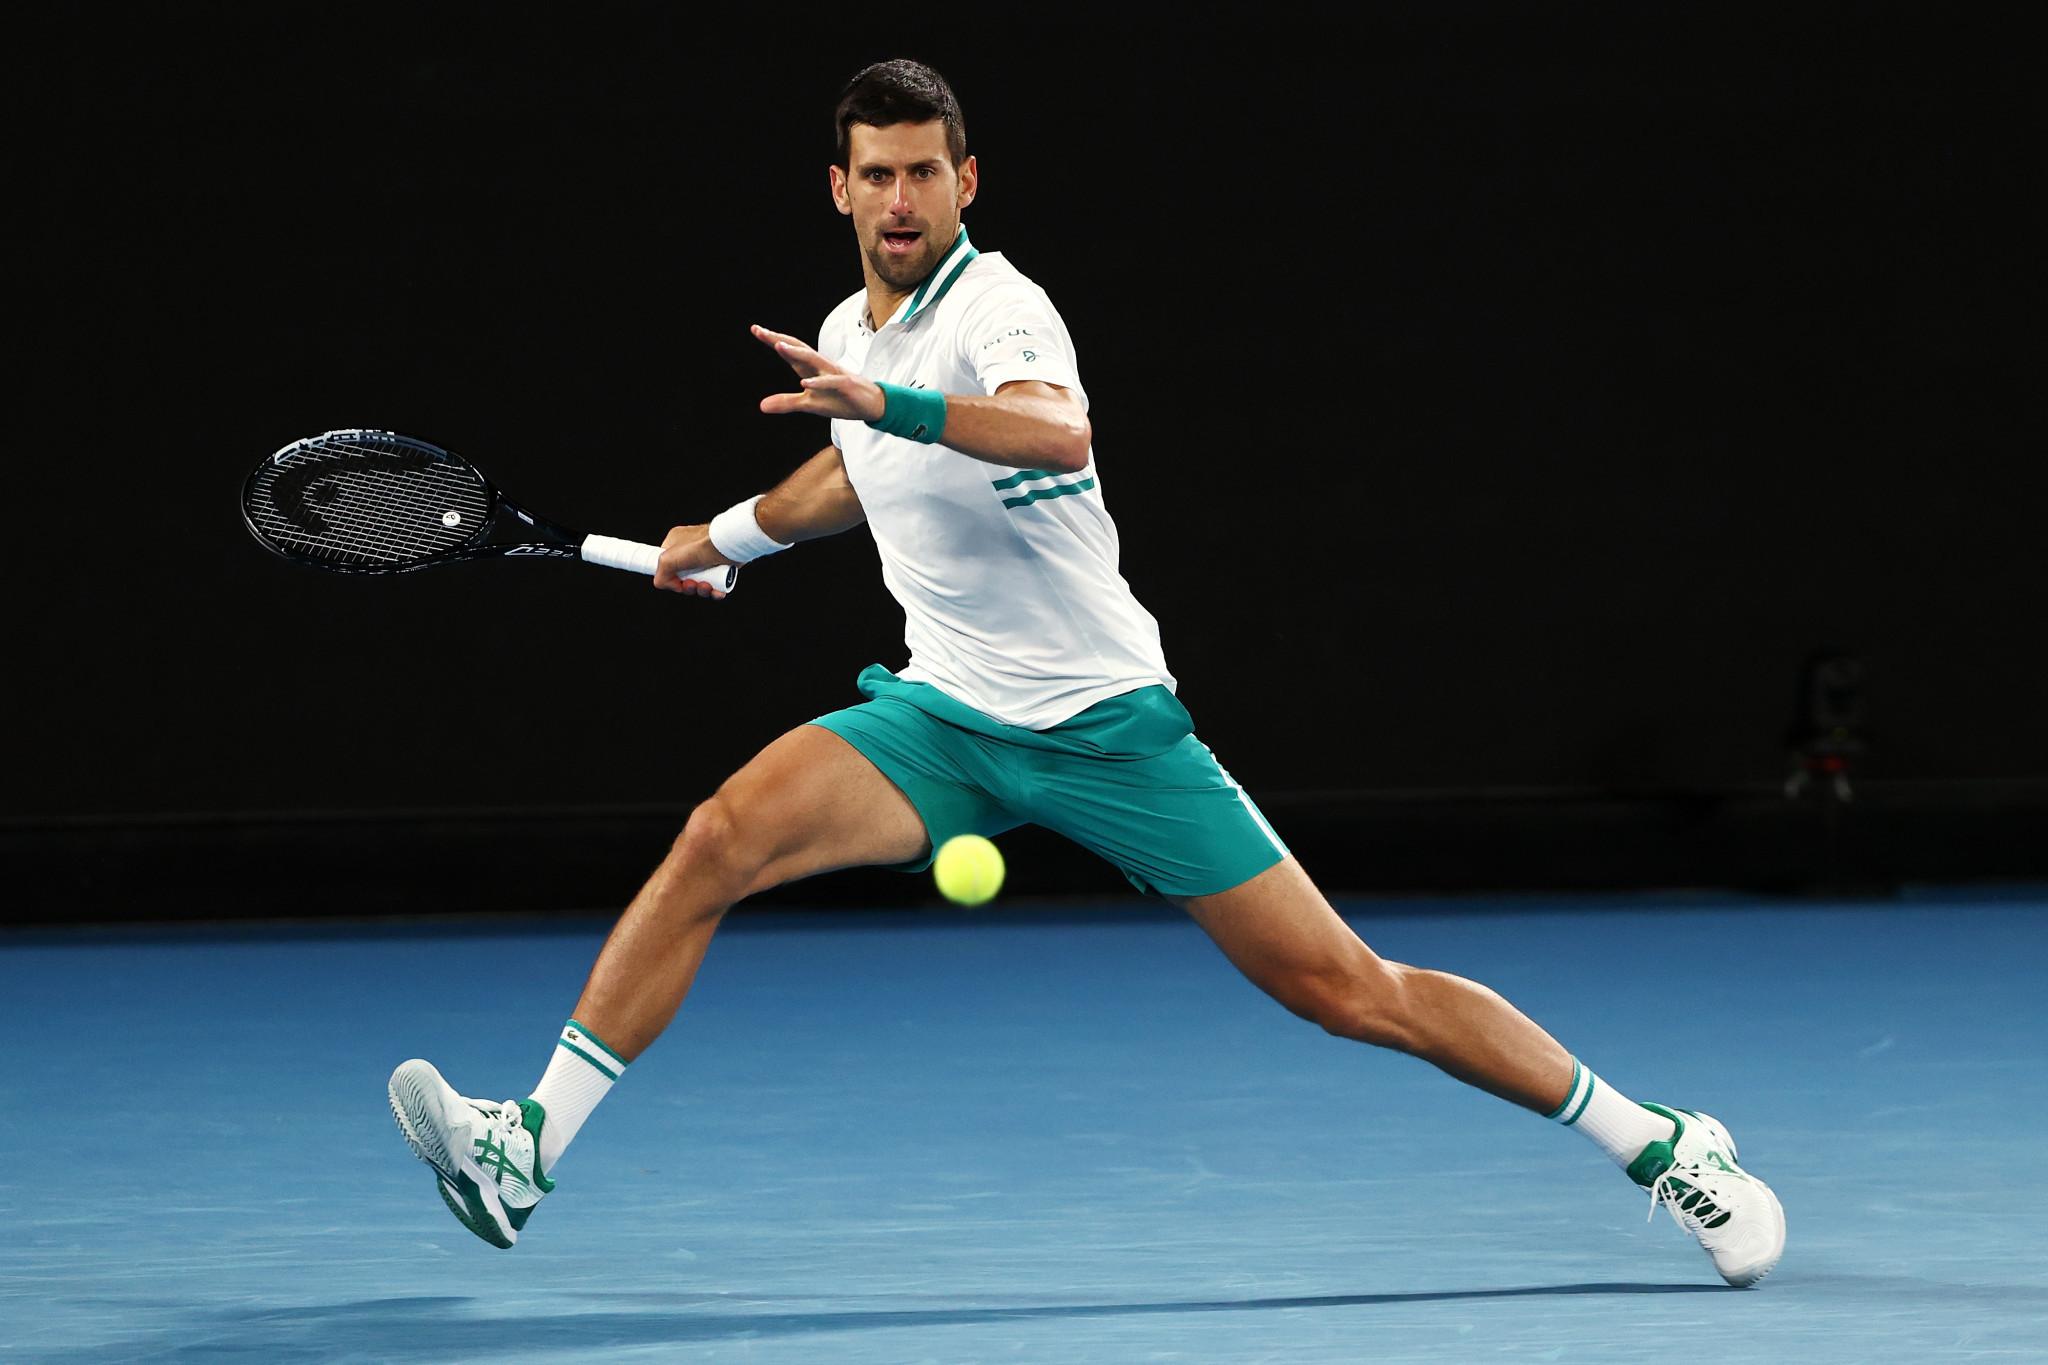 Djokovic battles past Raonic to reach quarter-finals of Australian Open